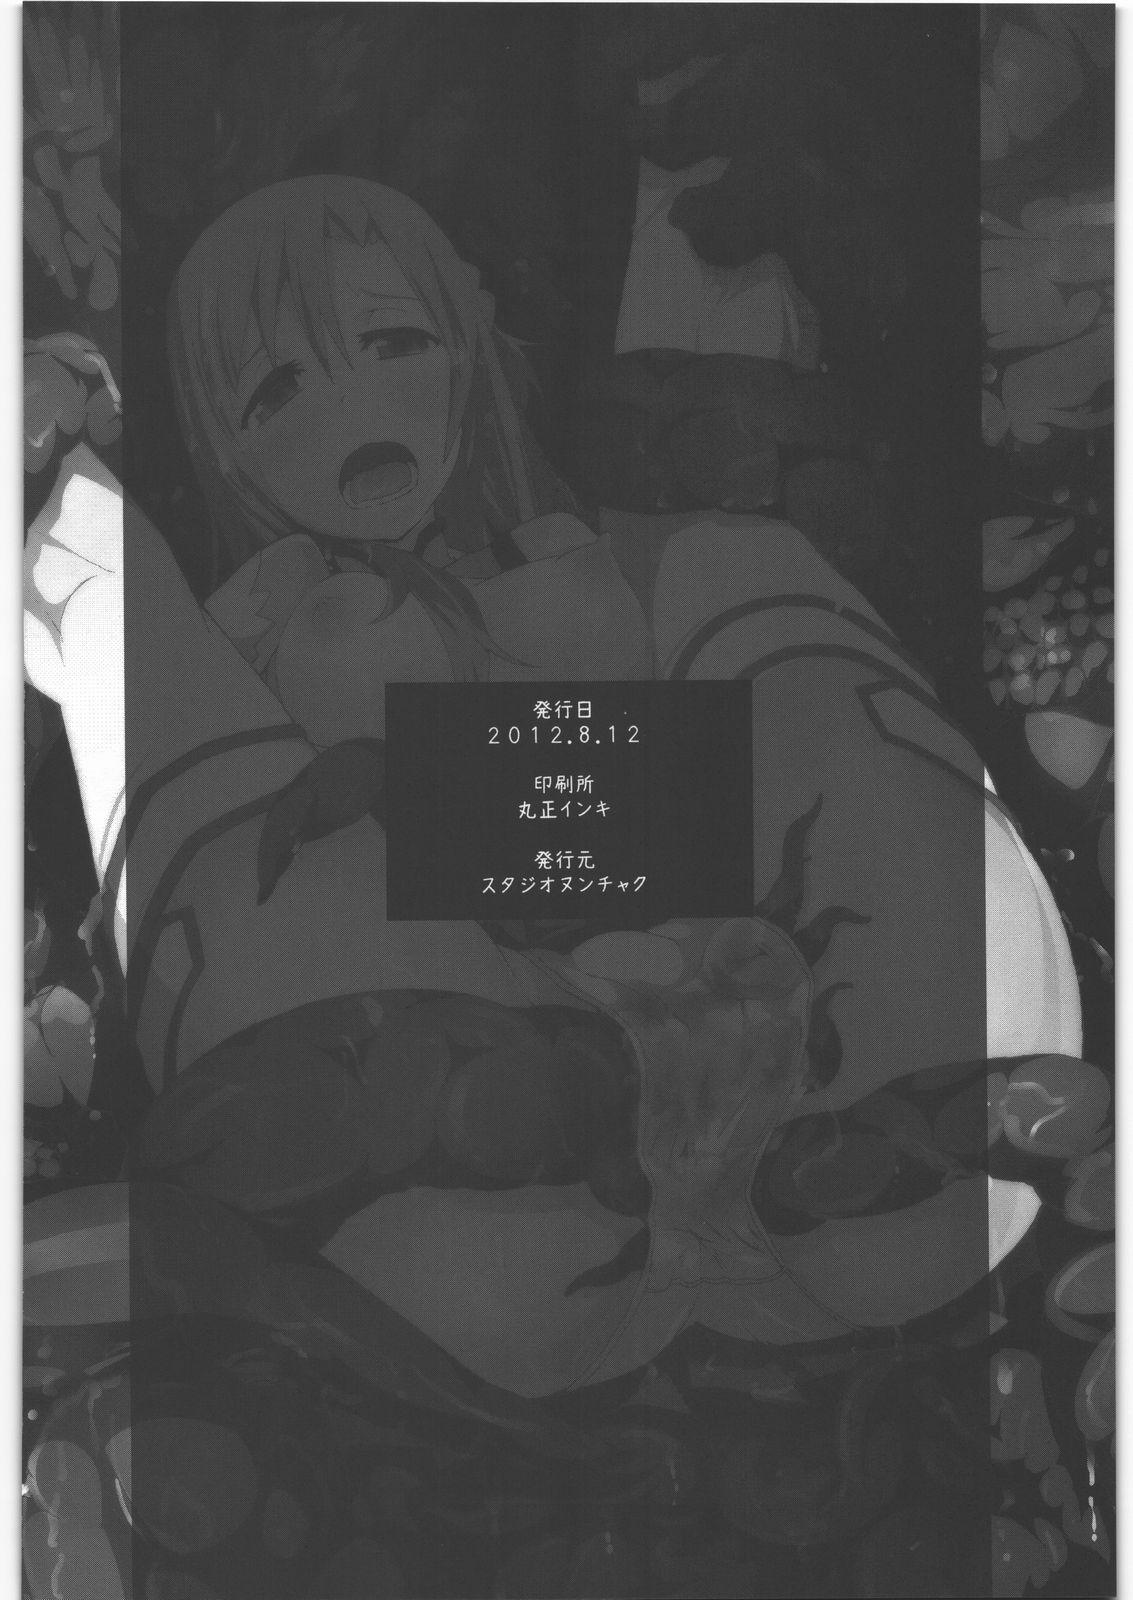 Asuna no Shokushu Party Ryoujoku Zeme Online 24